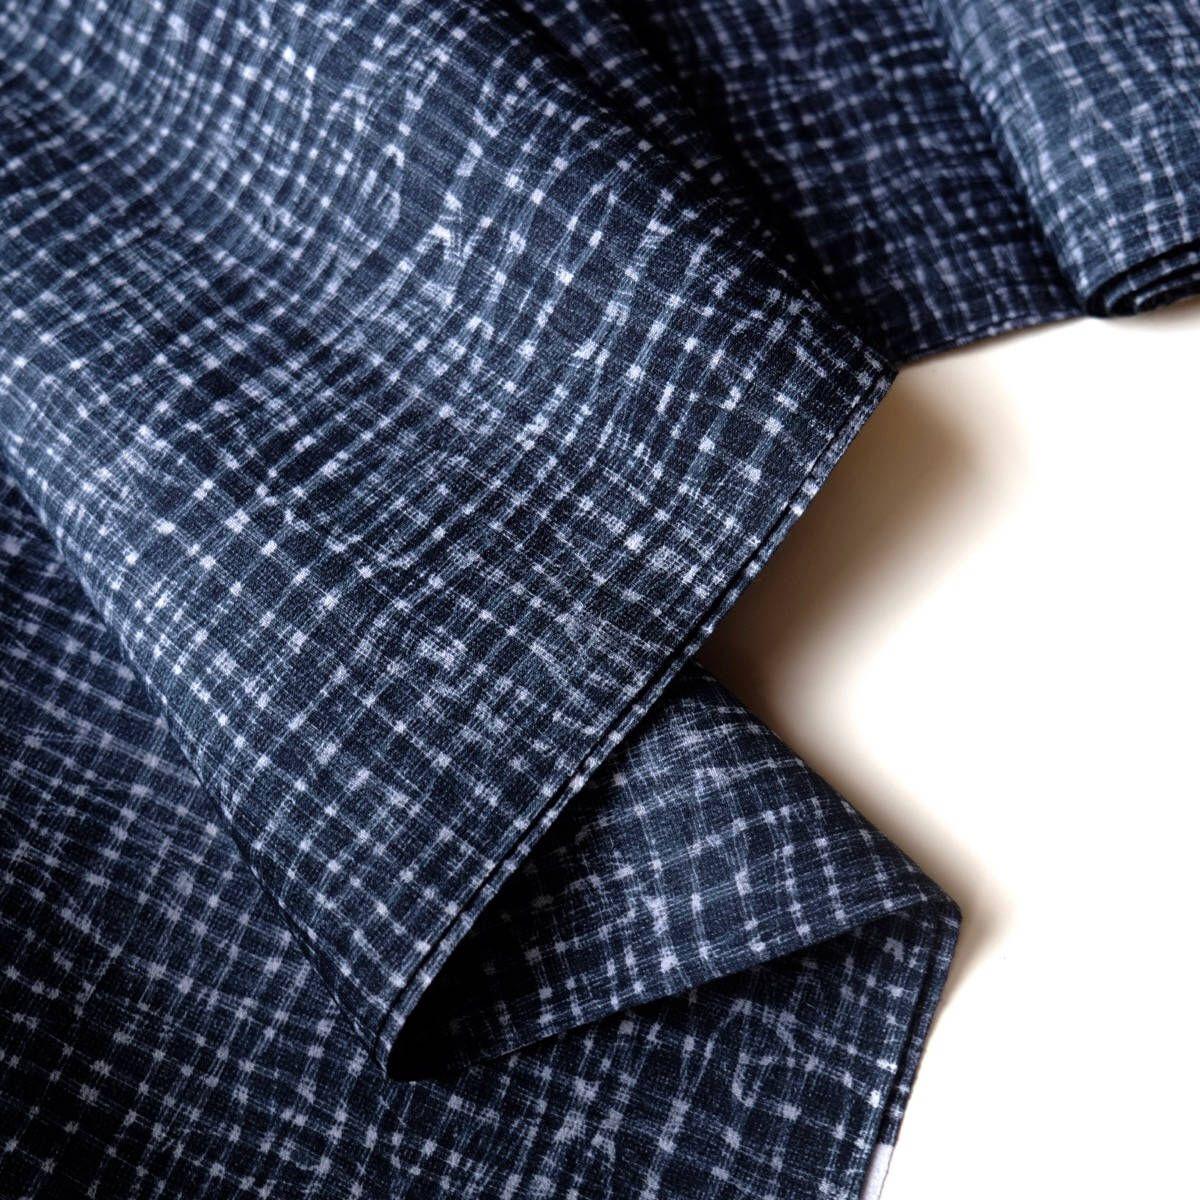 Indigo Yukata Cotton Kimono Fabric Unused Bolt By The Yard Etsy Cotton Kimono Kimono Fabric Indigo Fabric